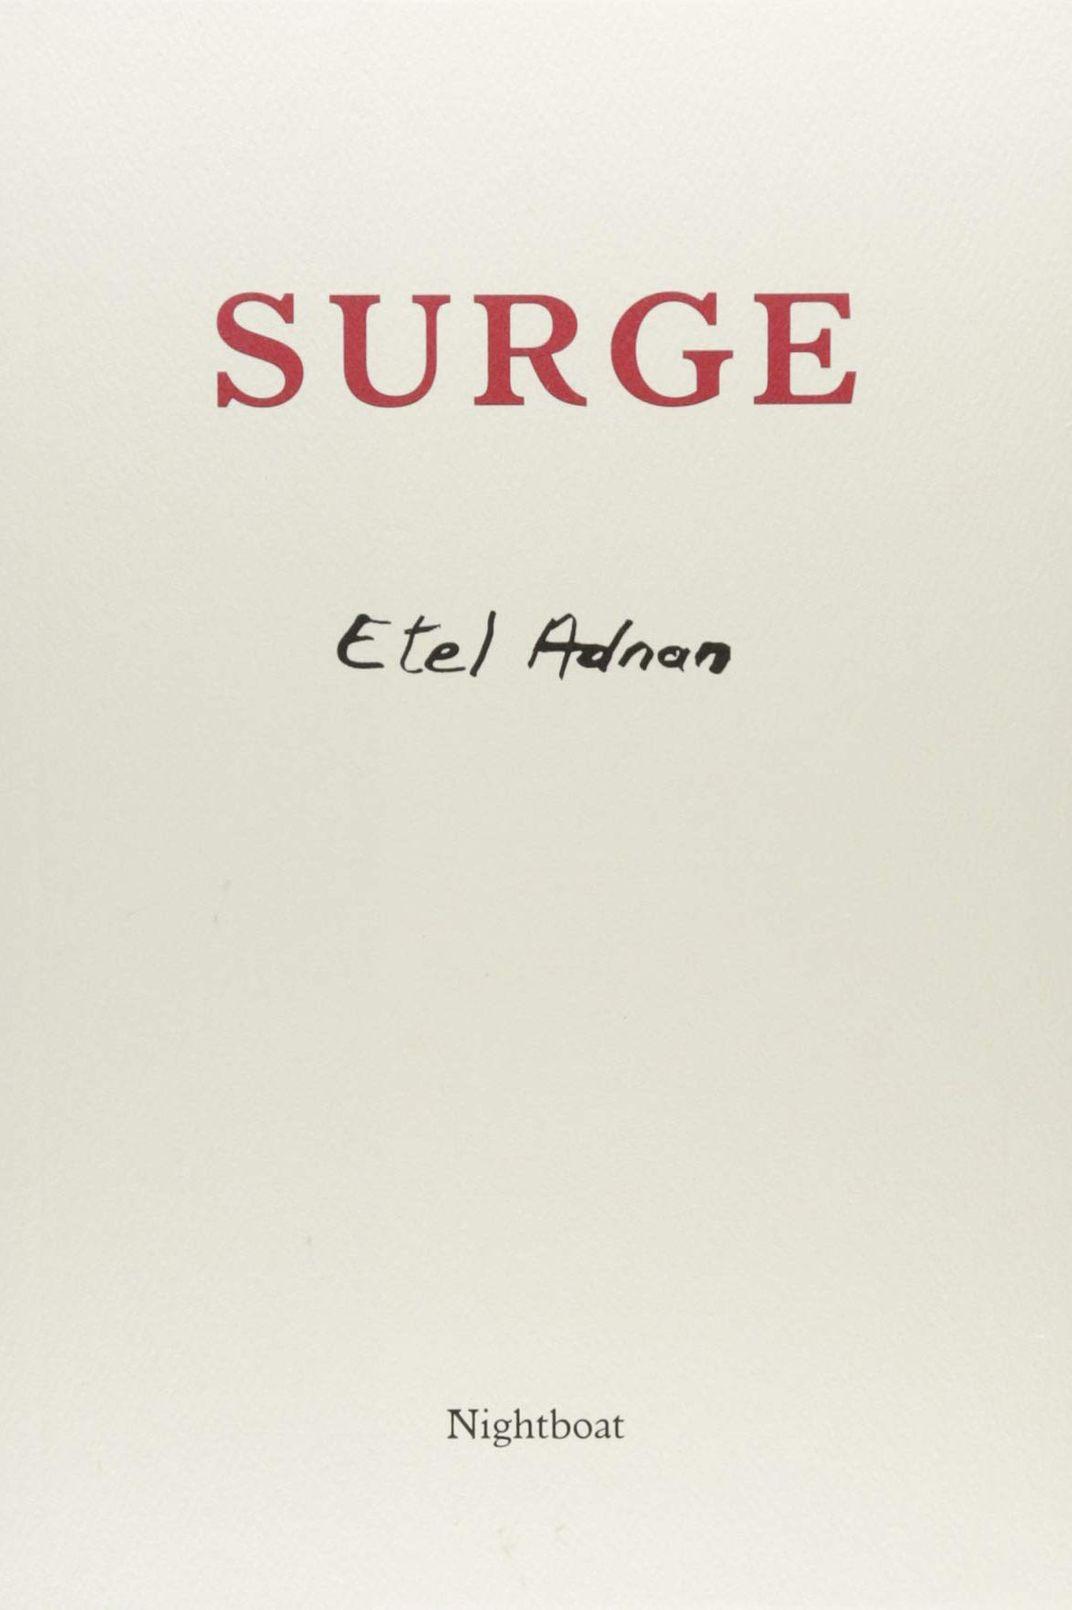 <em>Surge</em> by Etel Adnan